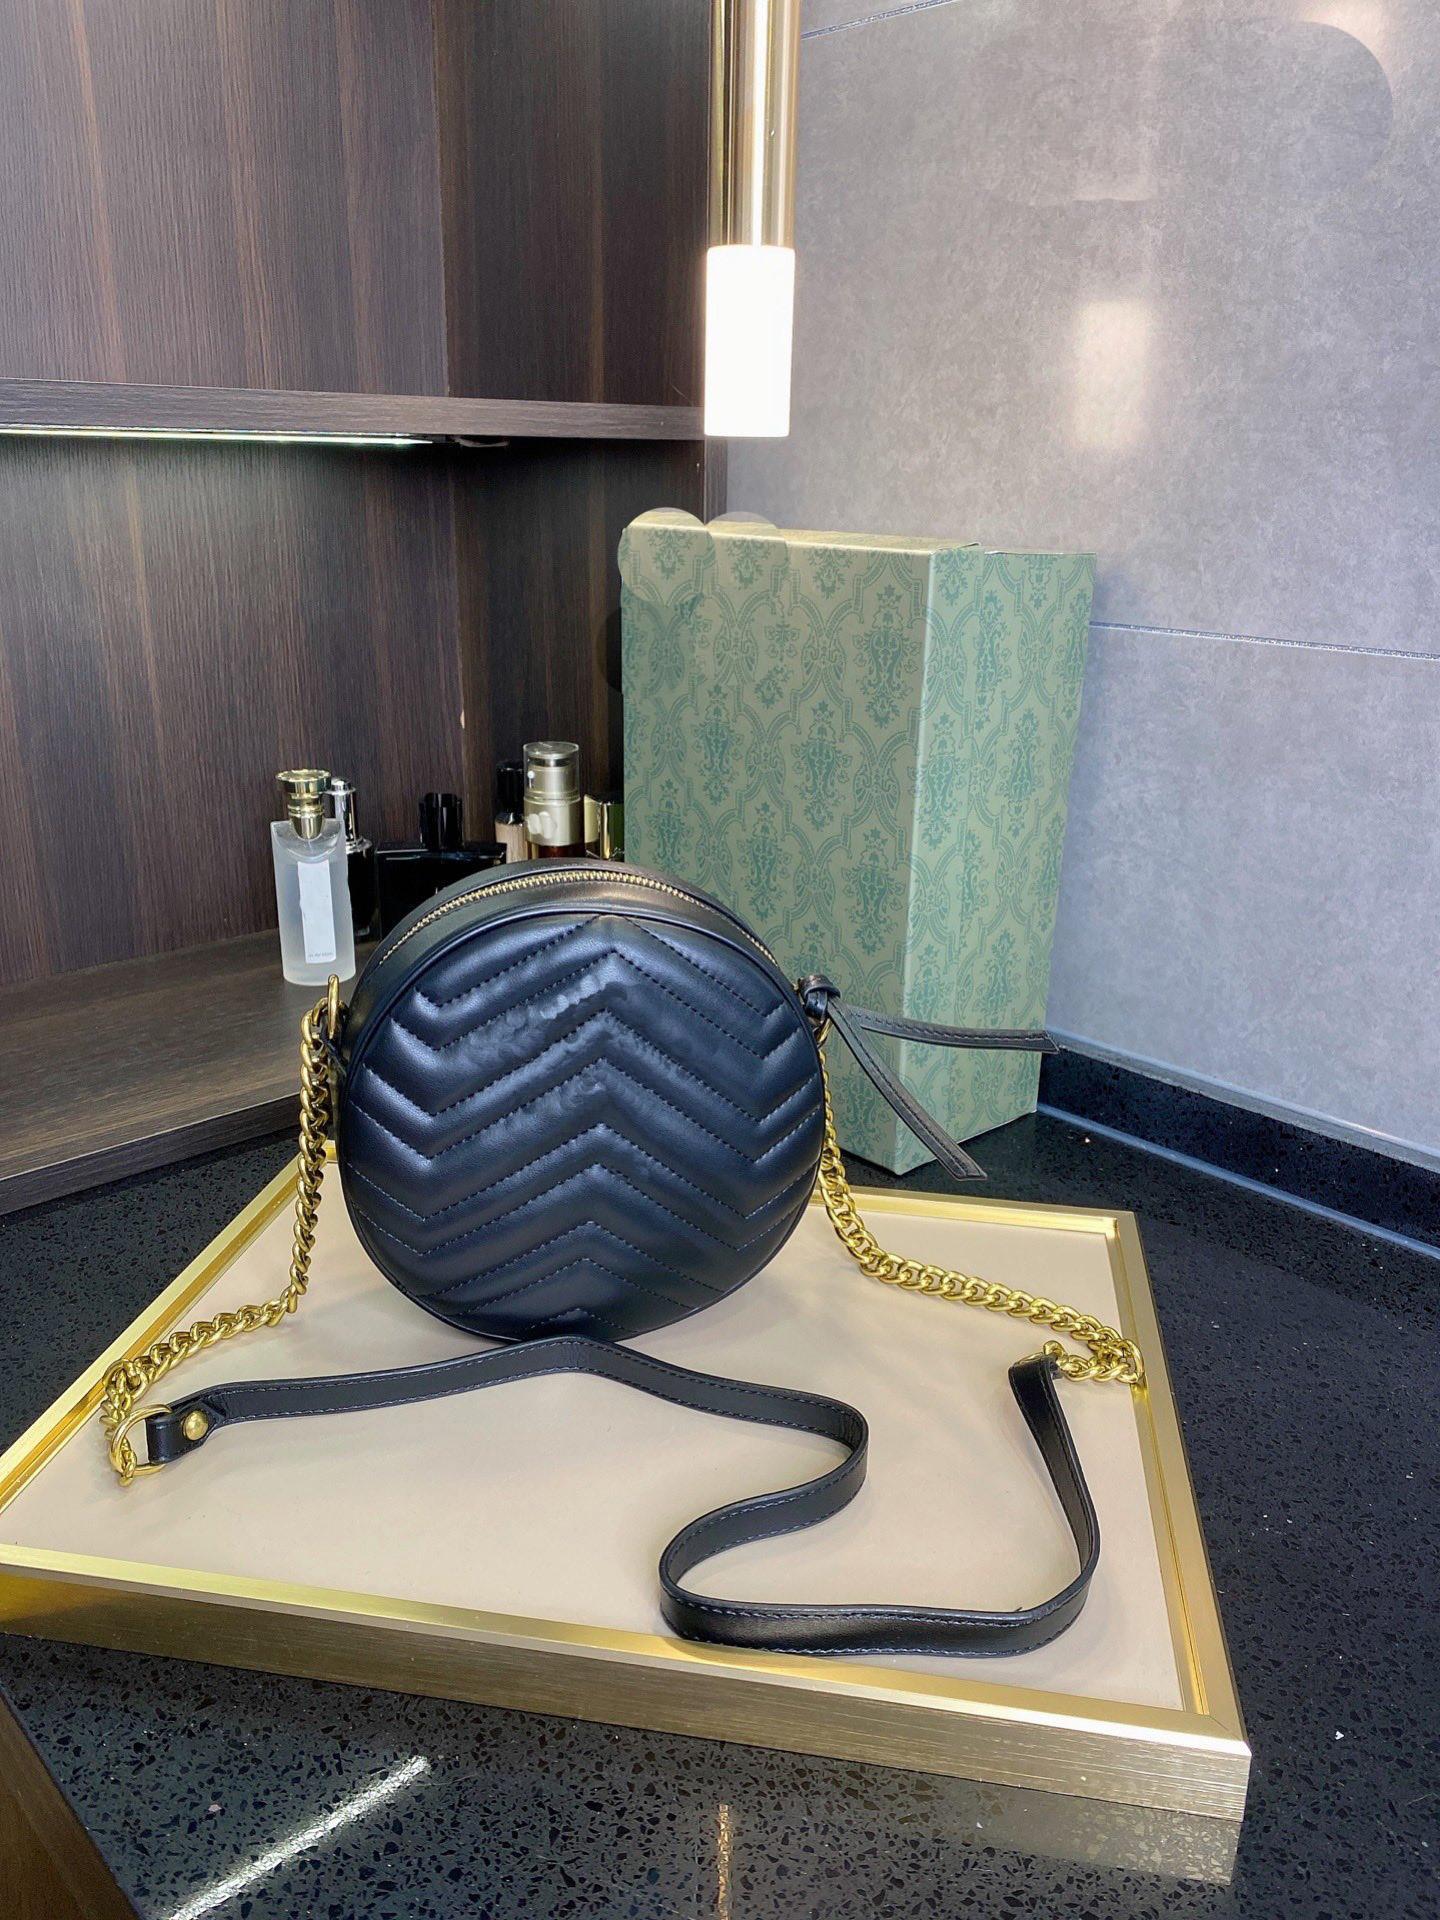 Quality Luxury Fashion Designer Totes Mini Bolsa de hombro Bolsos de cuero para mujer Mujeres Pequeñas bolsas redondas Messenger bolsas bolso de hombro # 12